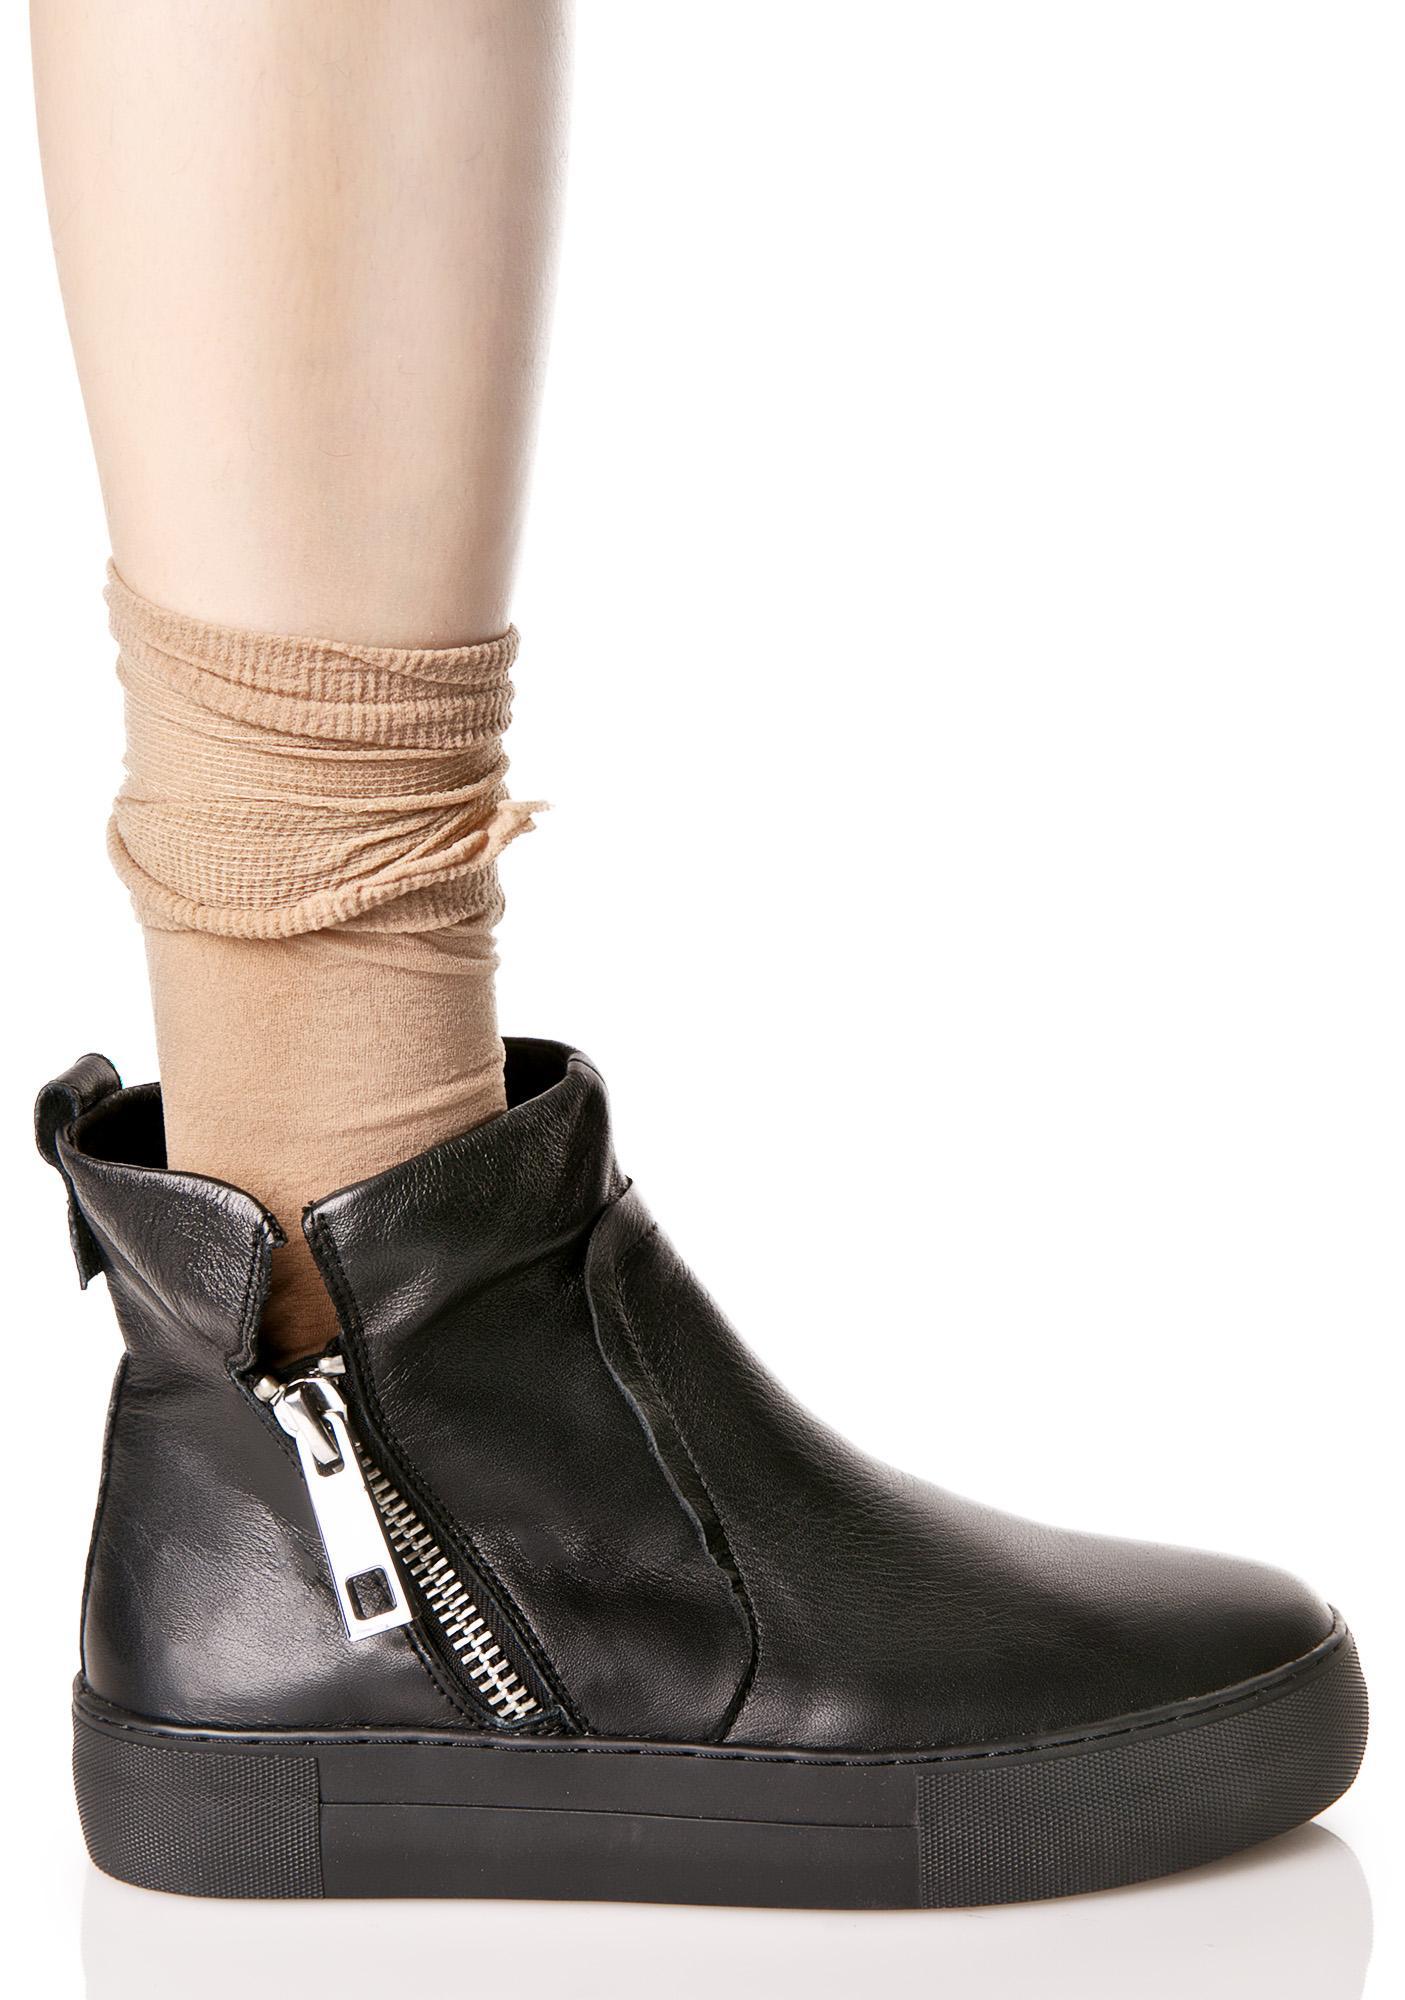 J Slides Astin Zip Up Flat Booties